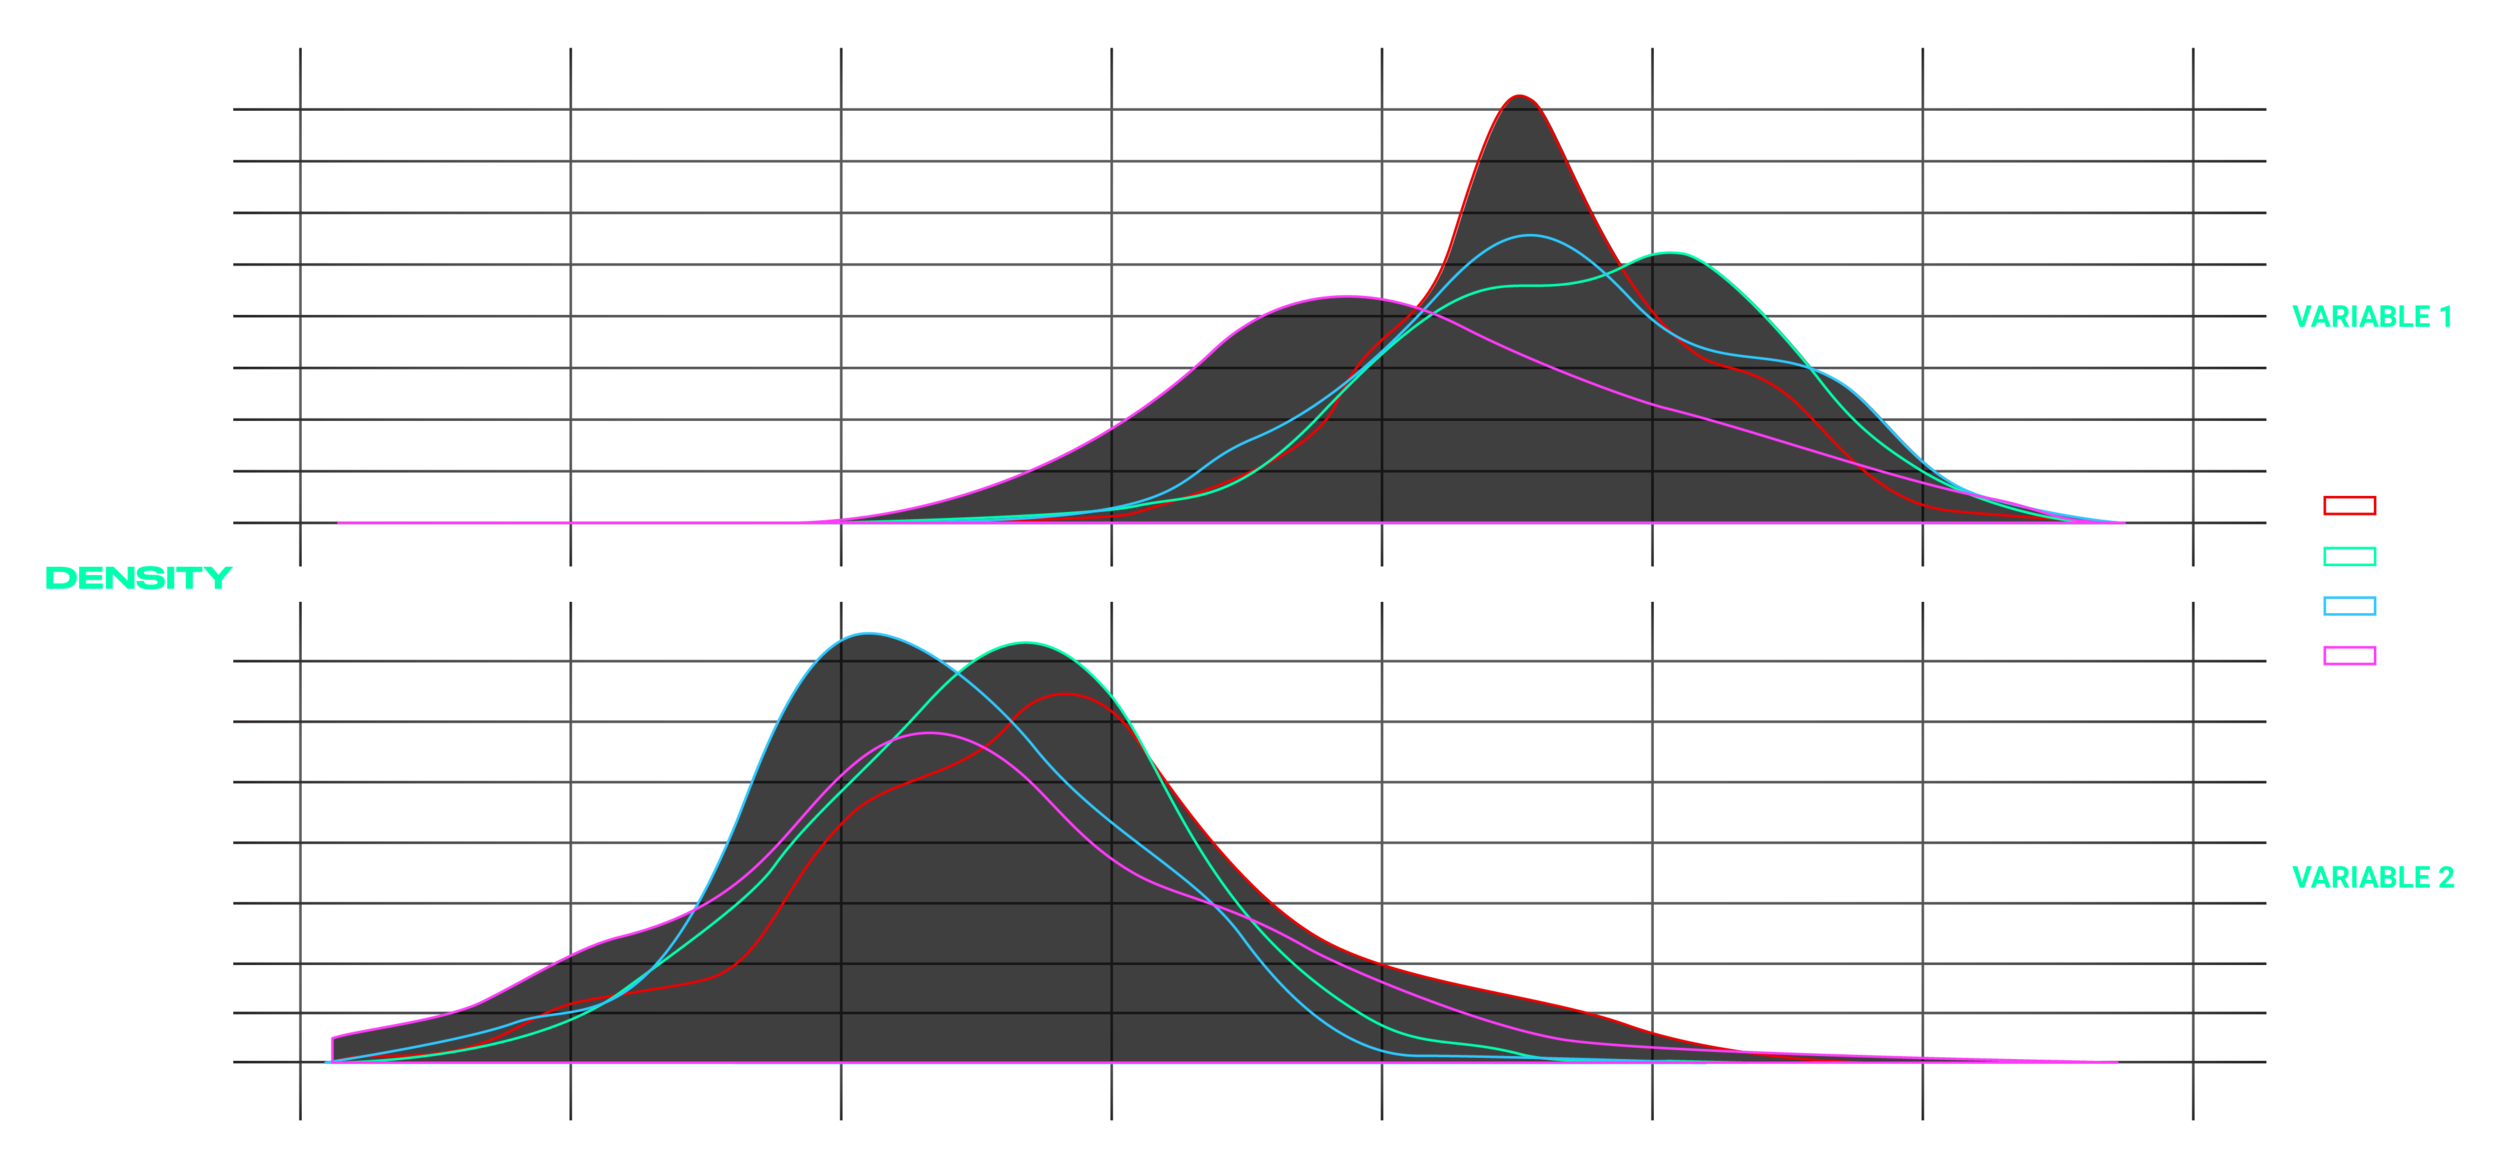 CdA Distribution by Run